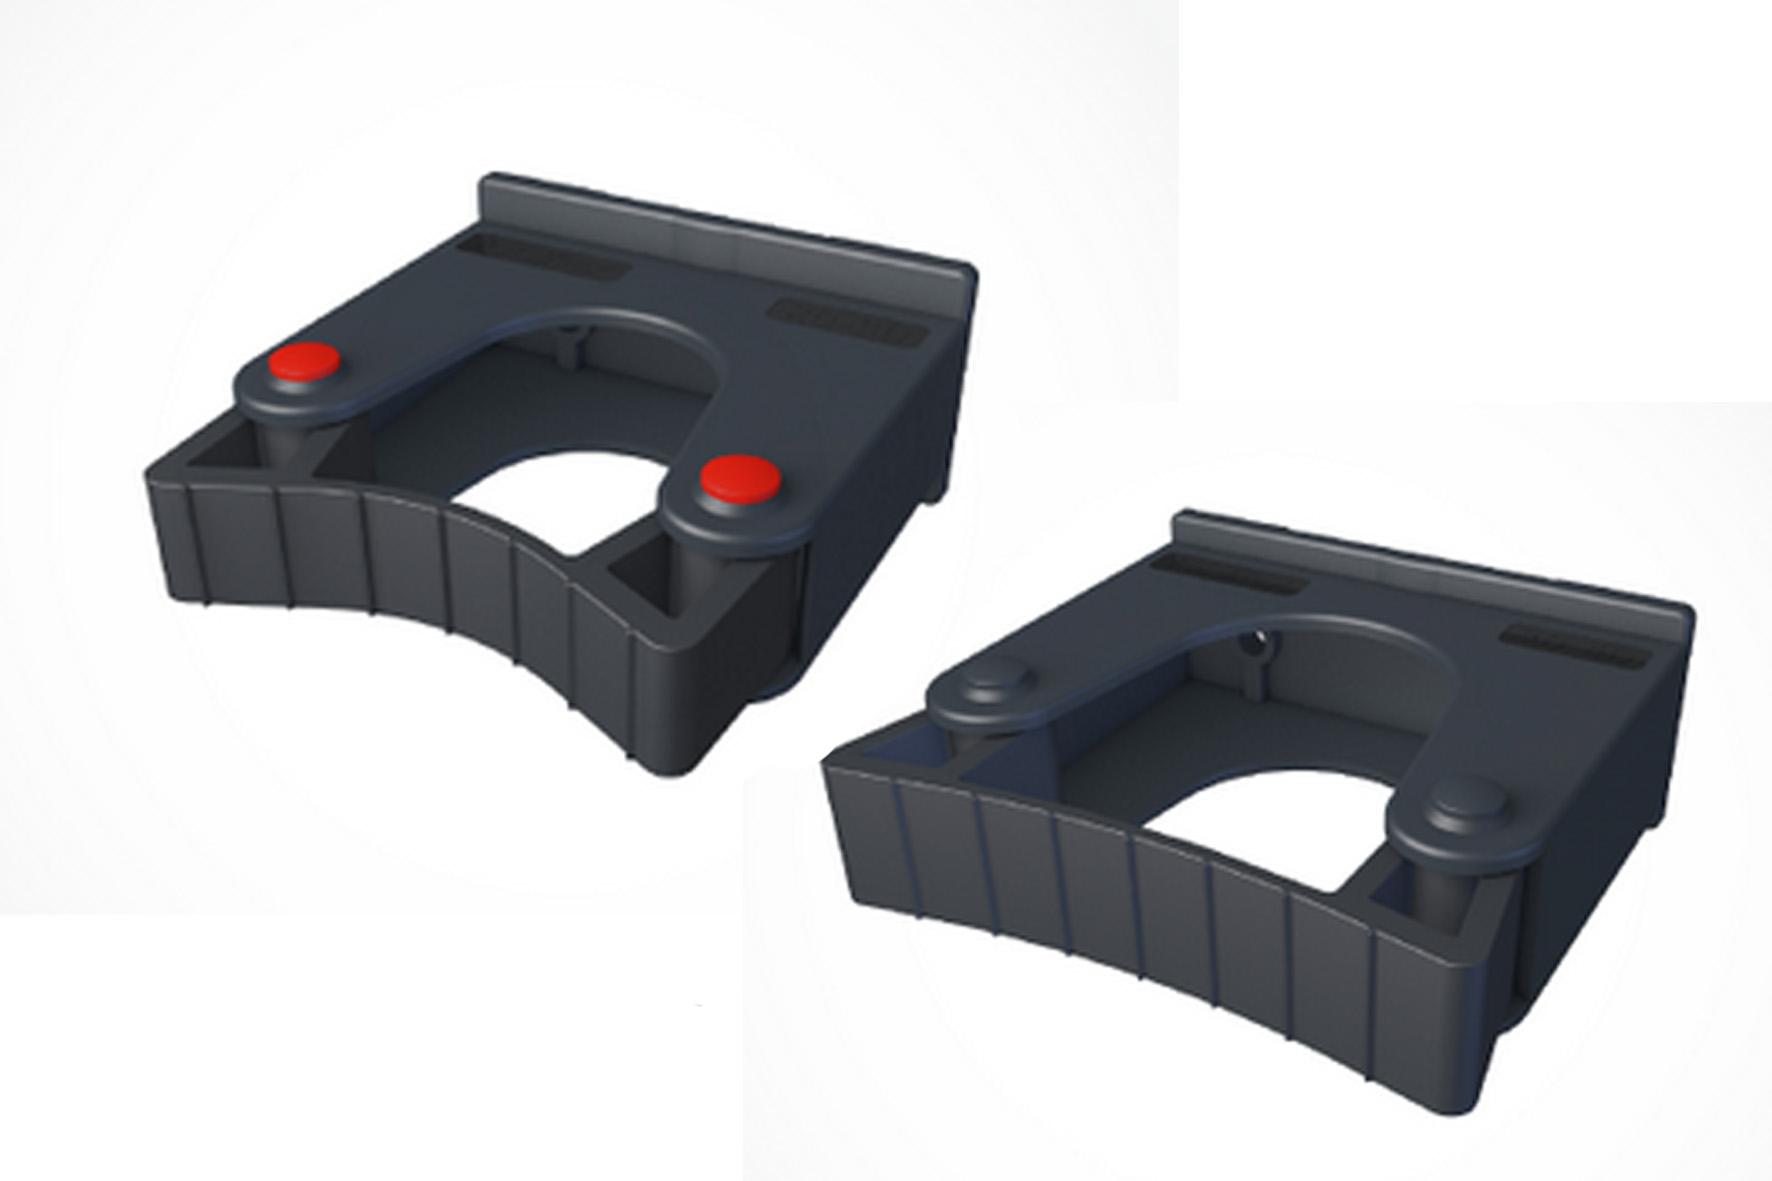 porte outils toolflex manche 39 39 clipser achat en ligne ou dans notre magasin. Black Bedroom Furniture Sets. Home Design Ideas